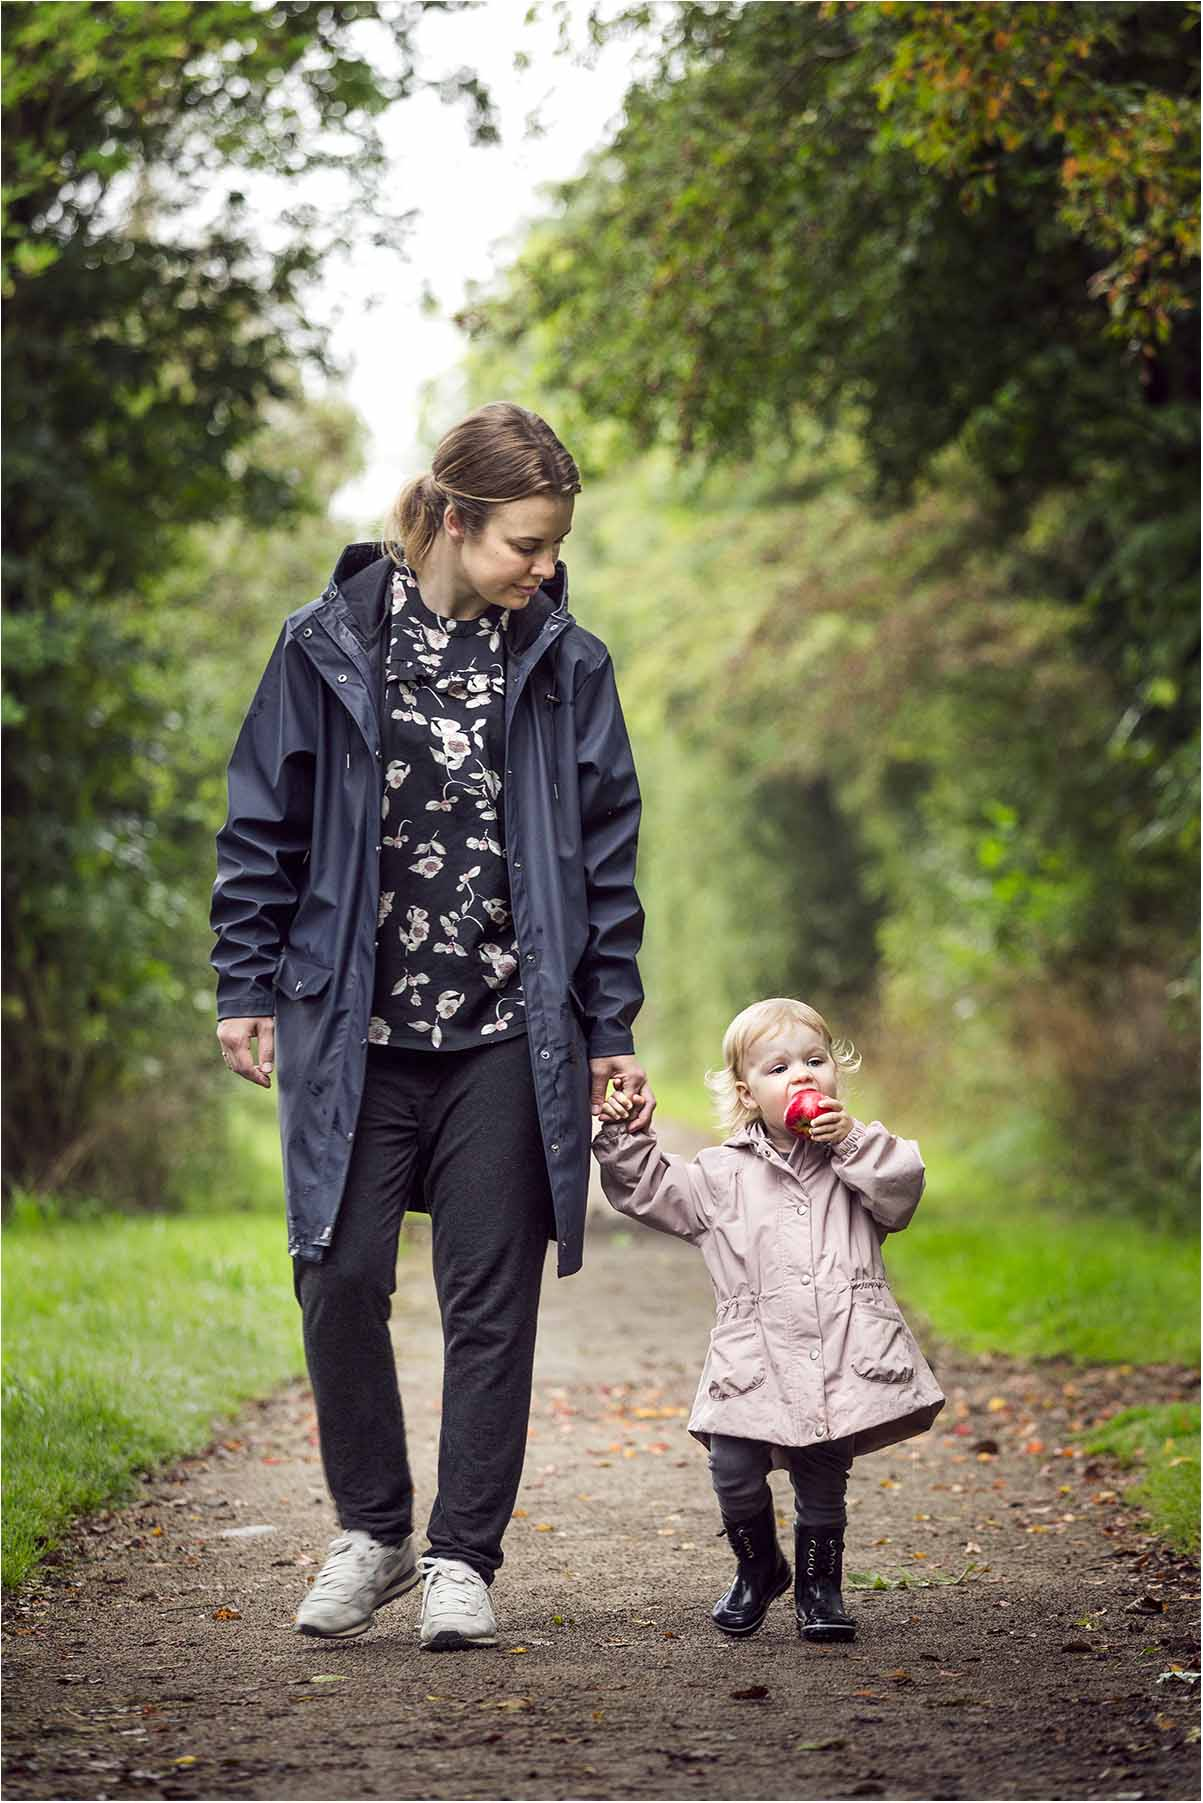 børnefotografer Horsens